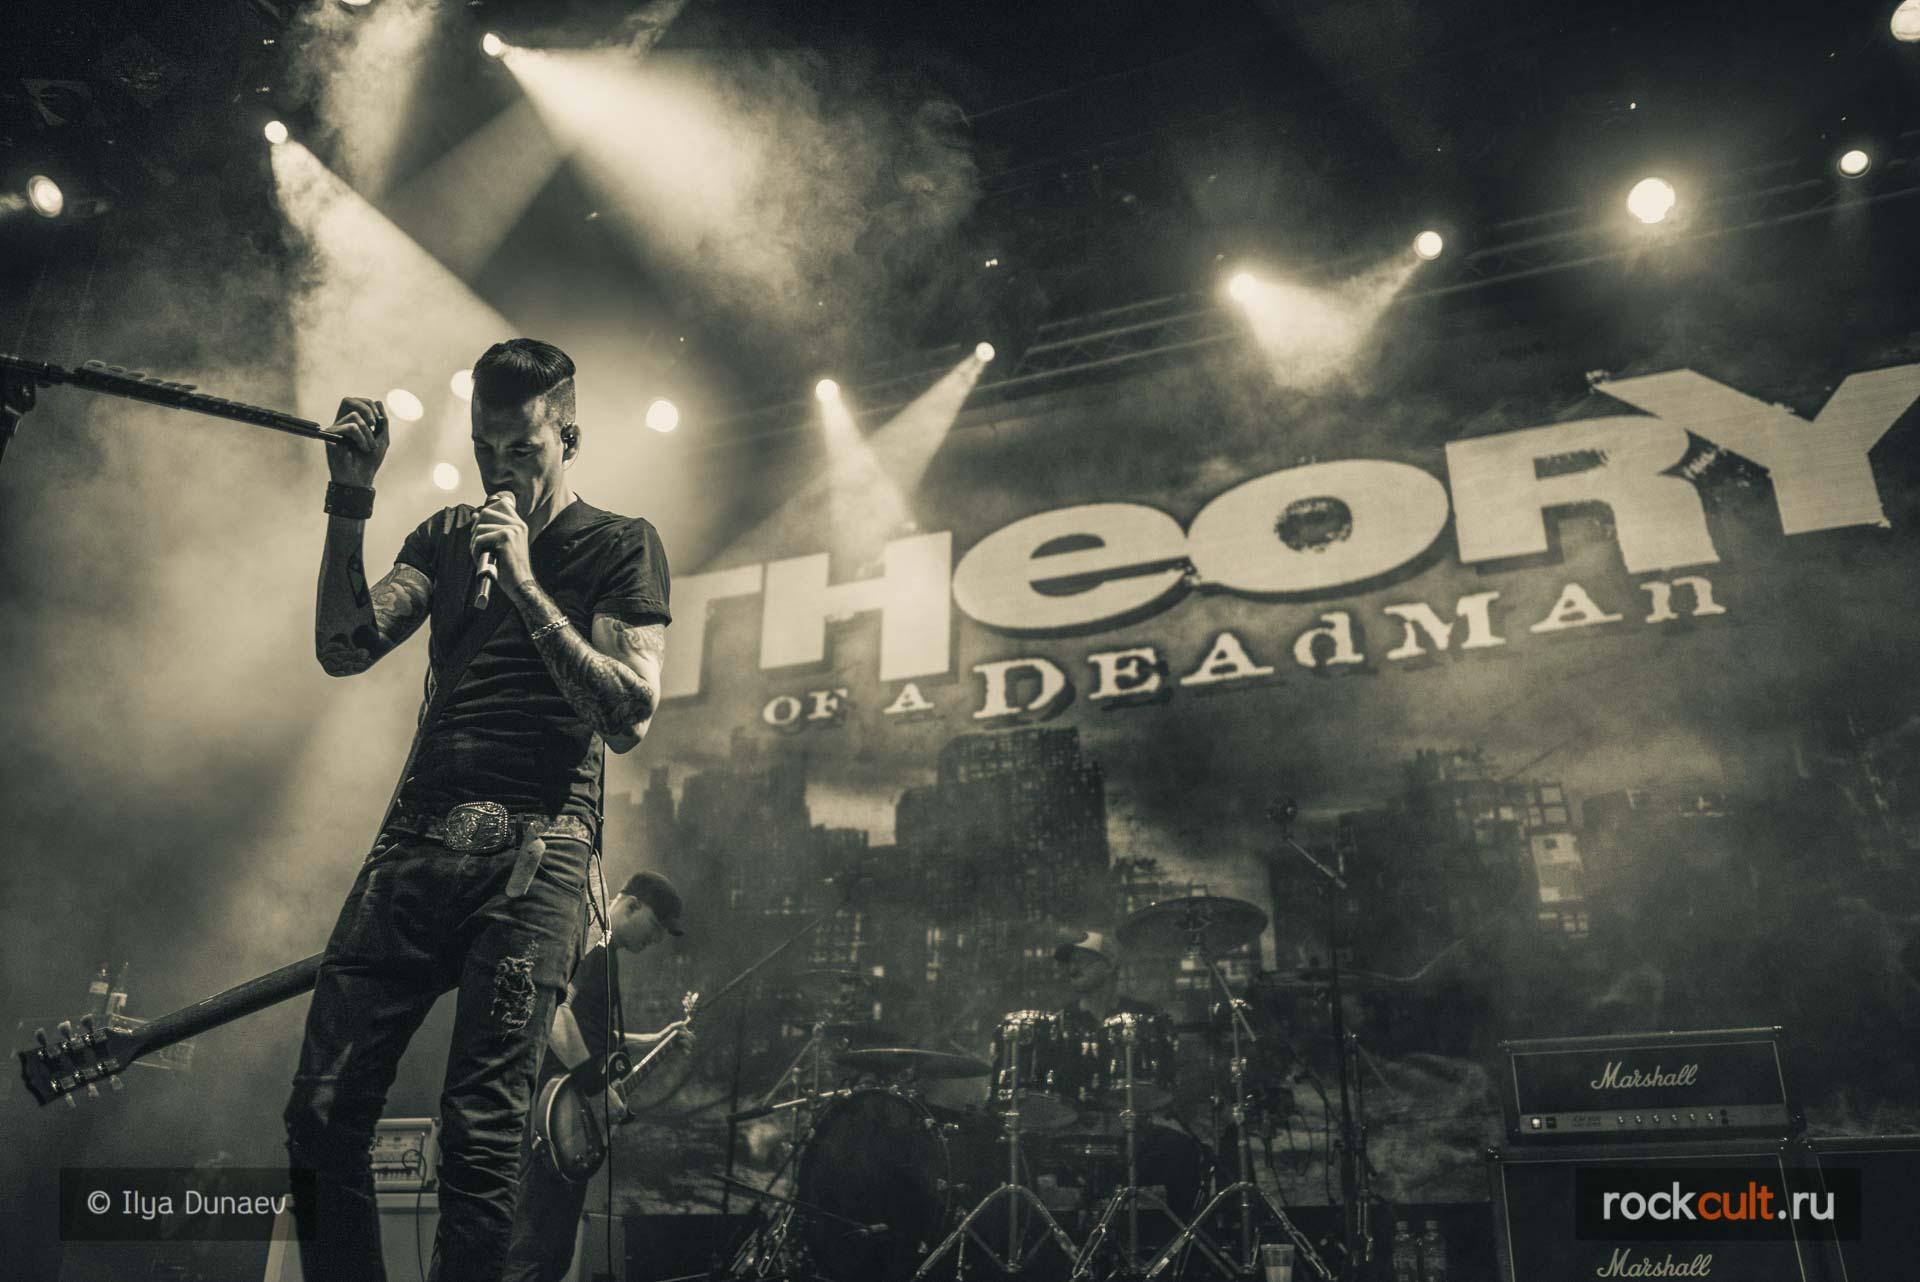 Фотоотчет| Theory Of A Deadman в Москве | Yotaspace | 23.02.2016